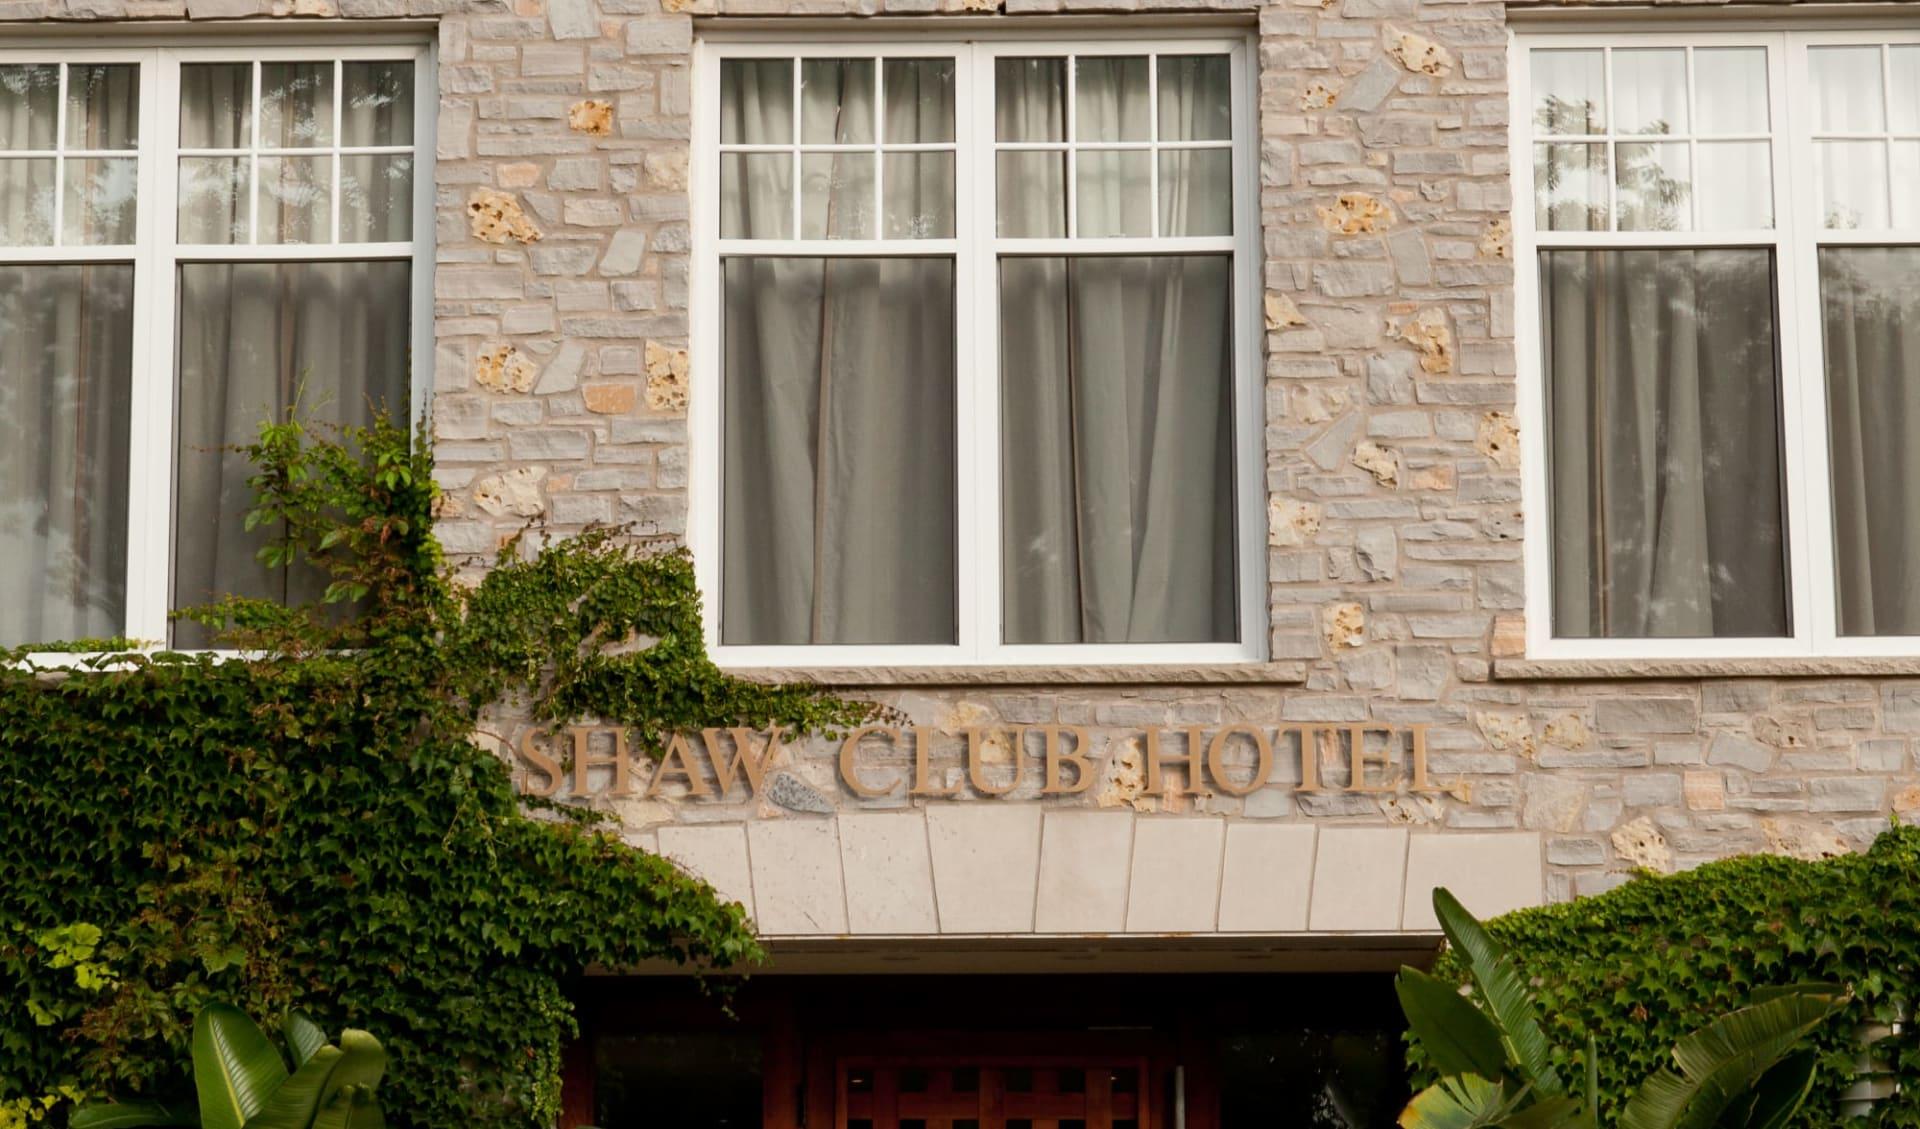 Shaw Club Hotel in Niagara on the Lake: Exterior_Shaw Club Hotel_Aussenansicht_Jonview